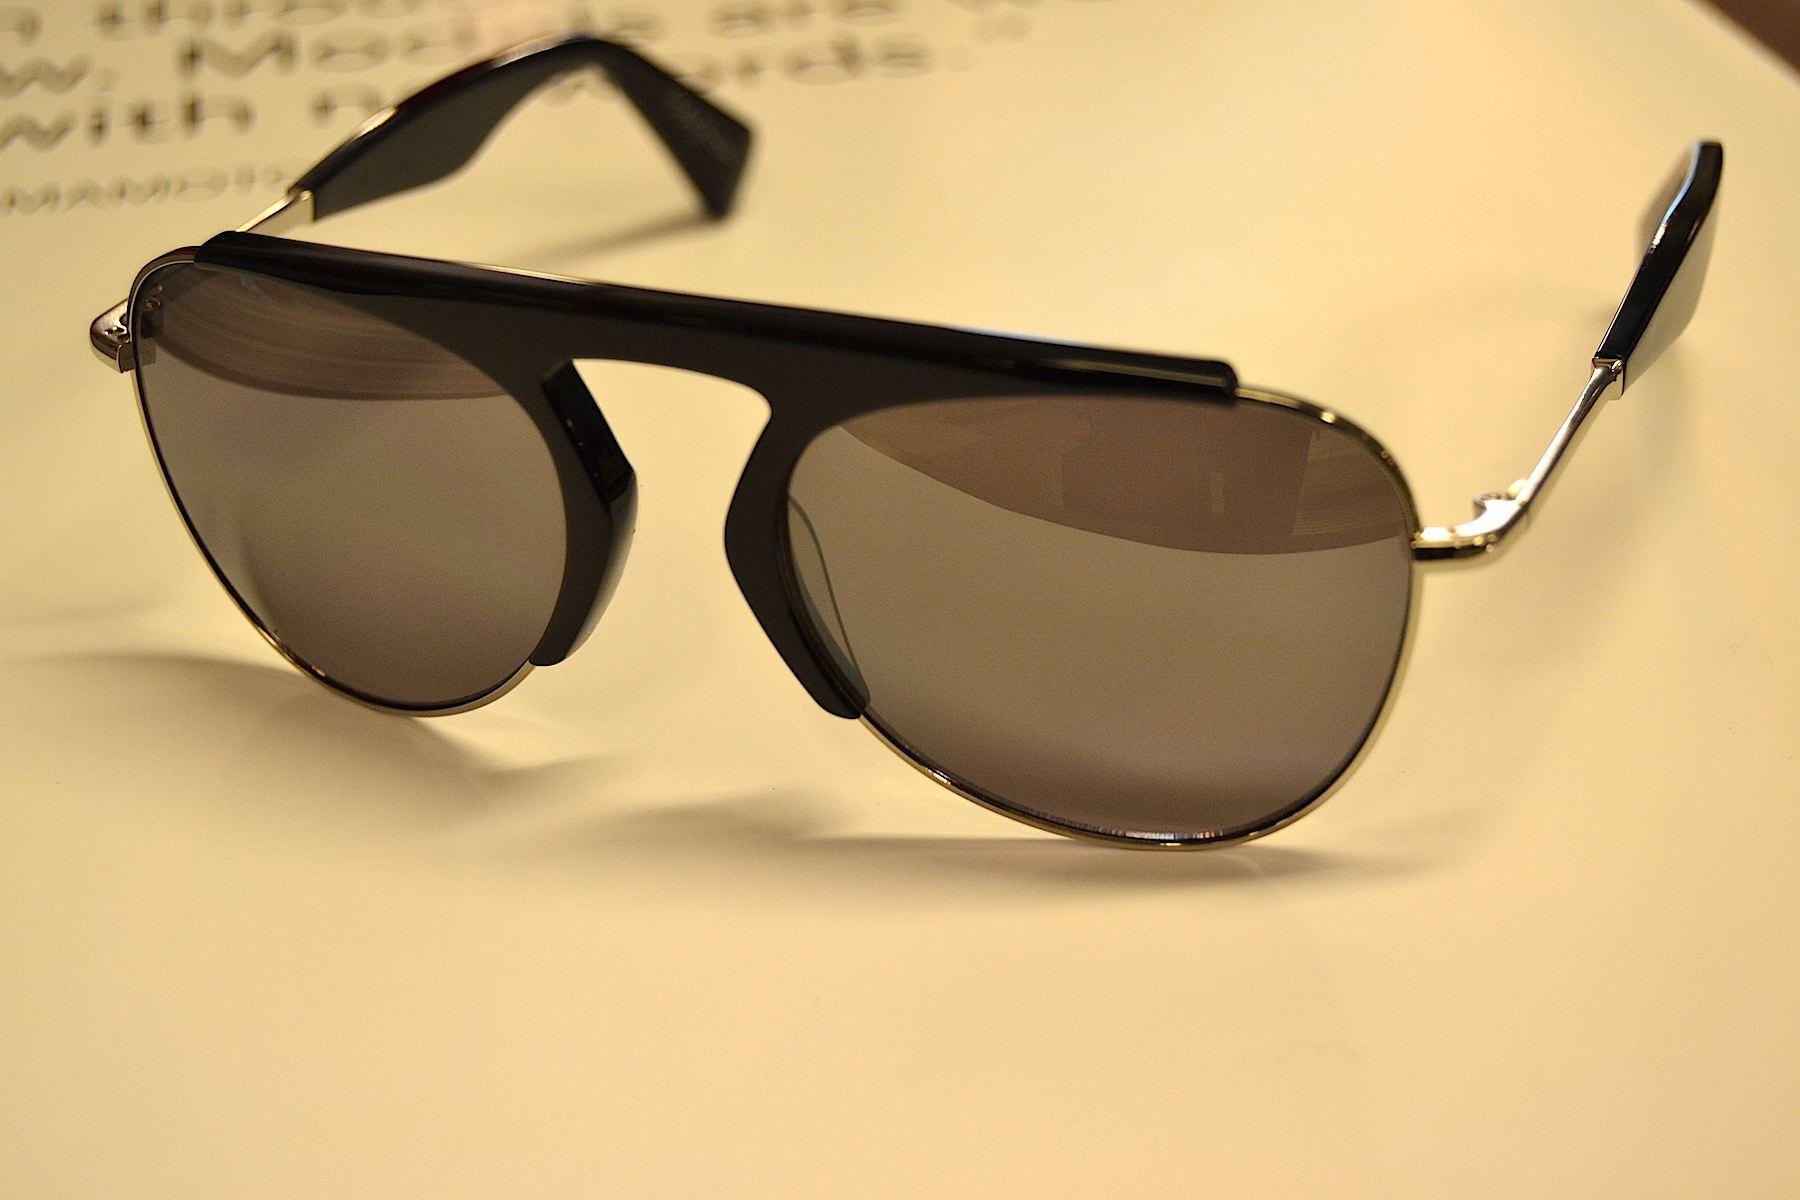 lenastore-bergamo-lenafashion-shop-online-yohji-yamamoto-gli-occhiali-sunglasses-7